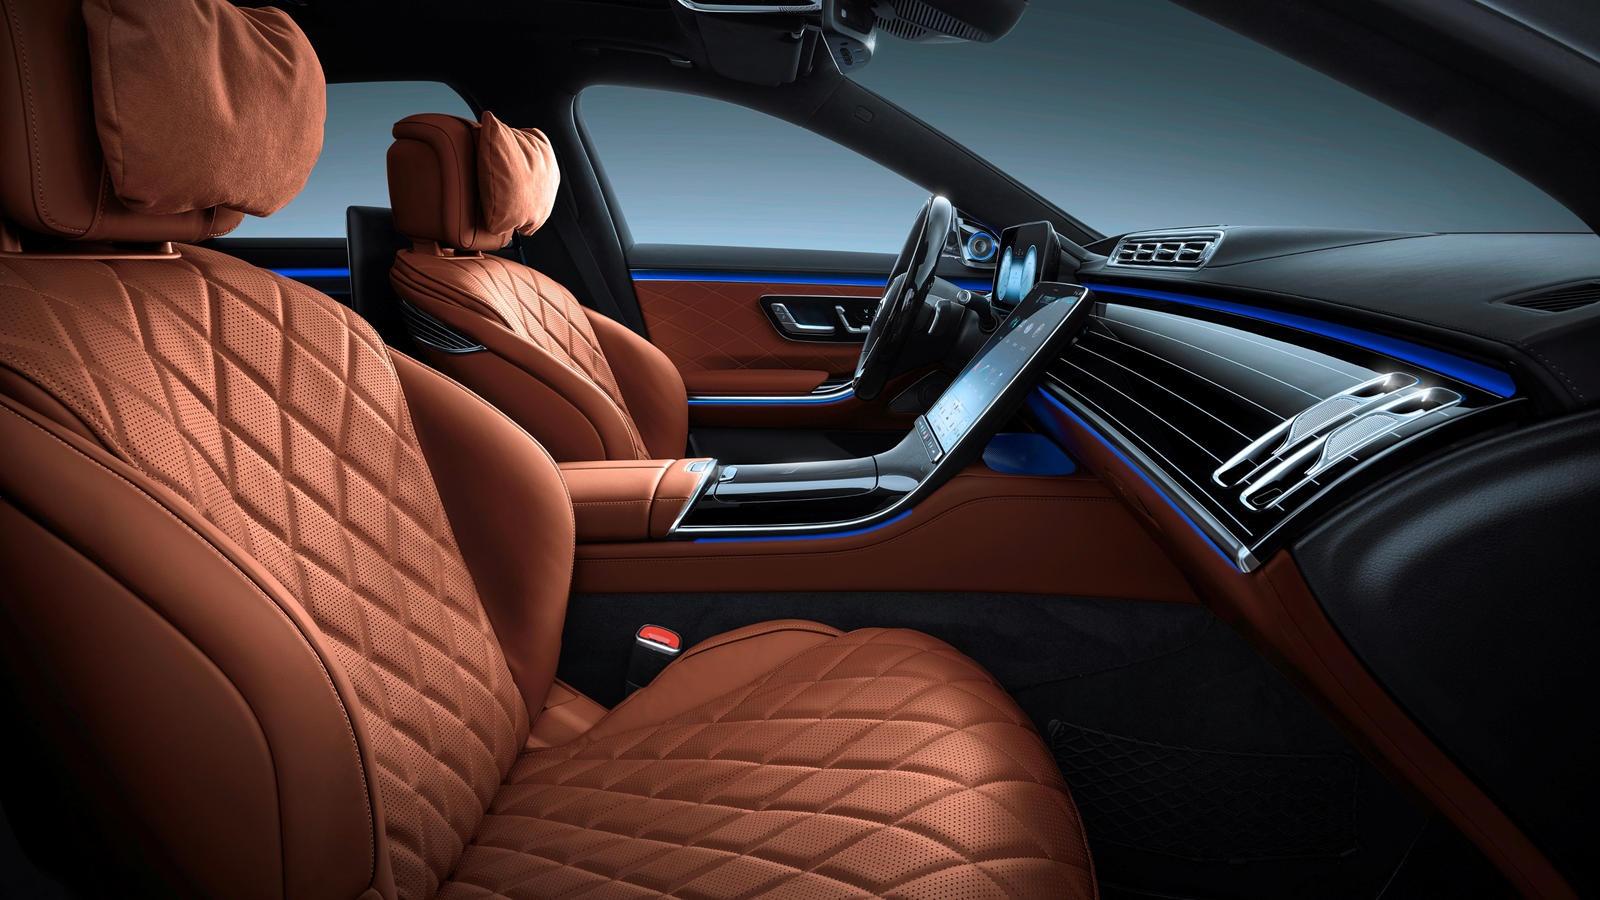 danh gia Mercedes-Benz S-Class 2021 anh 11